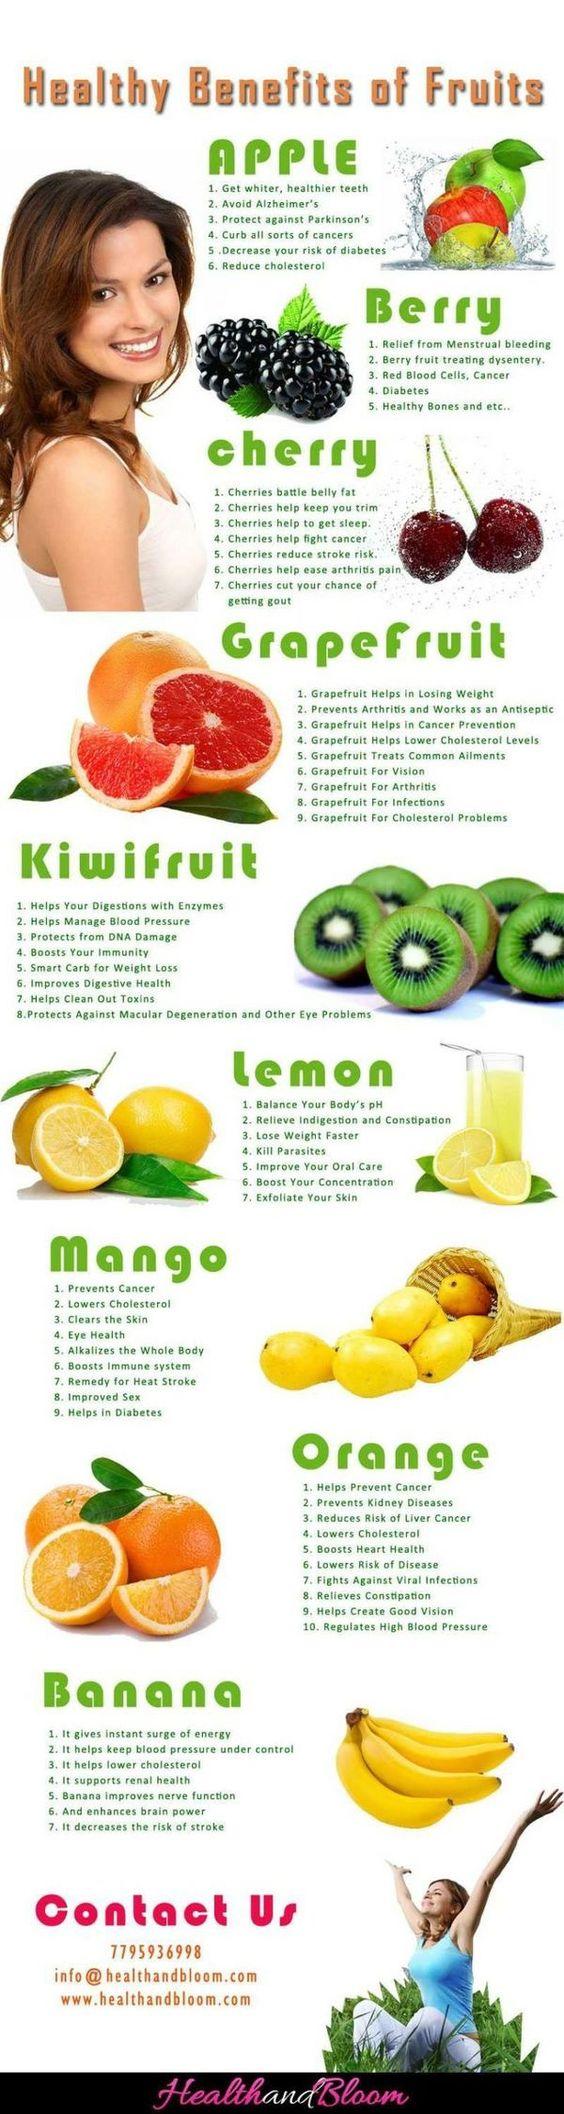 Health benefits of fruits Super foods Super fruits Healthy lifestyle #diet #dietplan #dietprogram #food #weightloss #loseweight